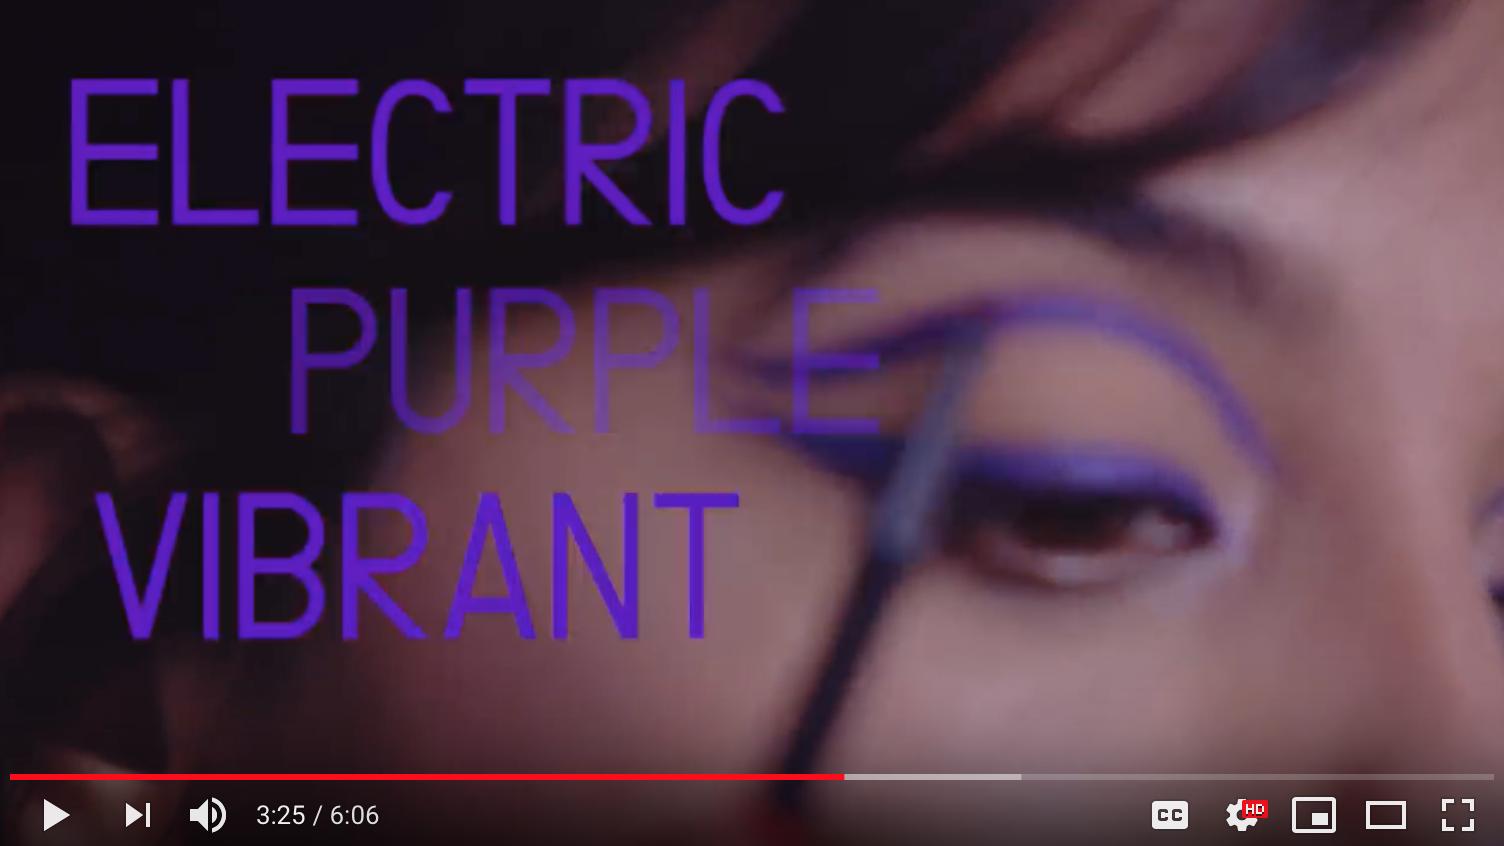 Image taken from Violette_fr's YouTube channel